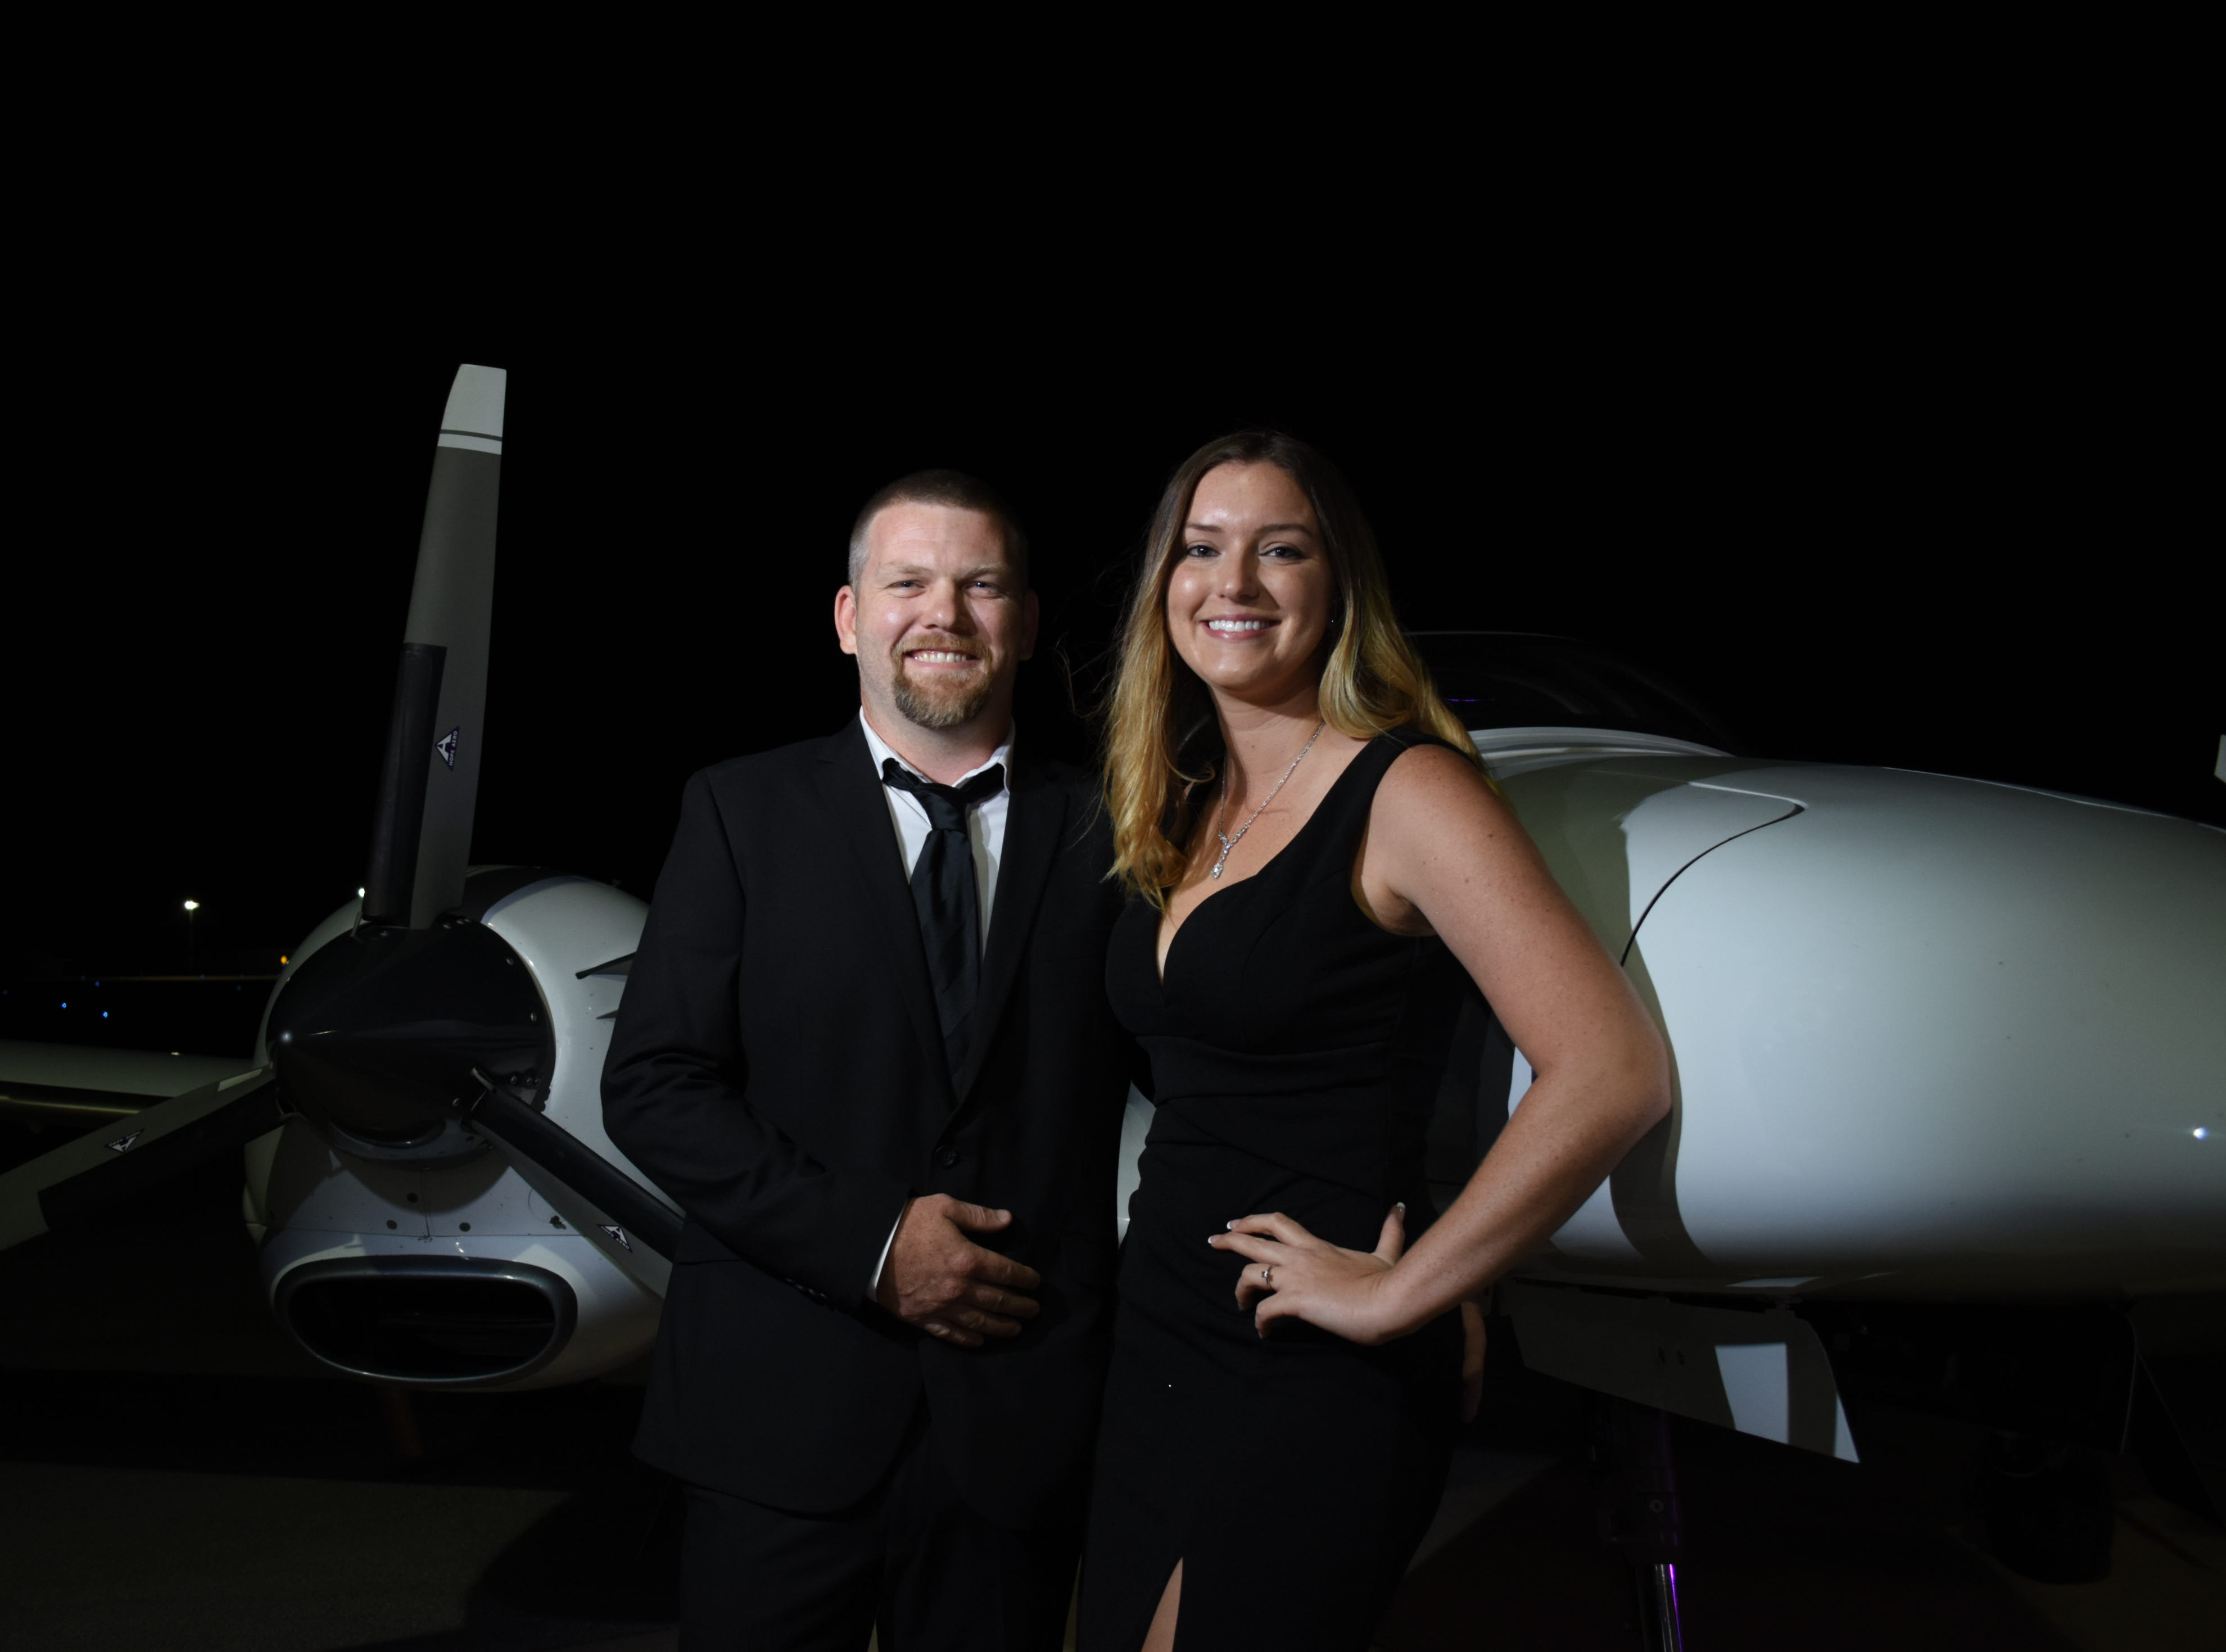 Jamey Blythe and Ashley Bussberg pose for a photo.